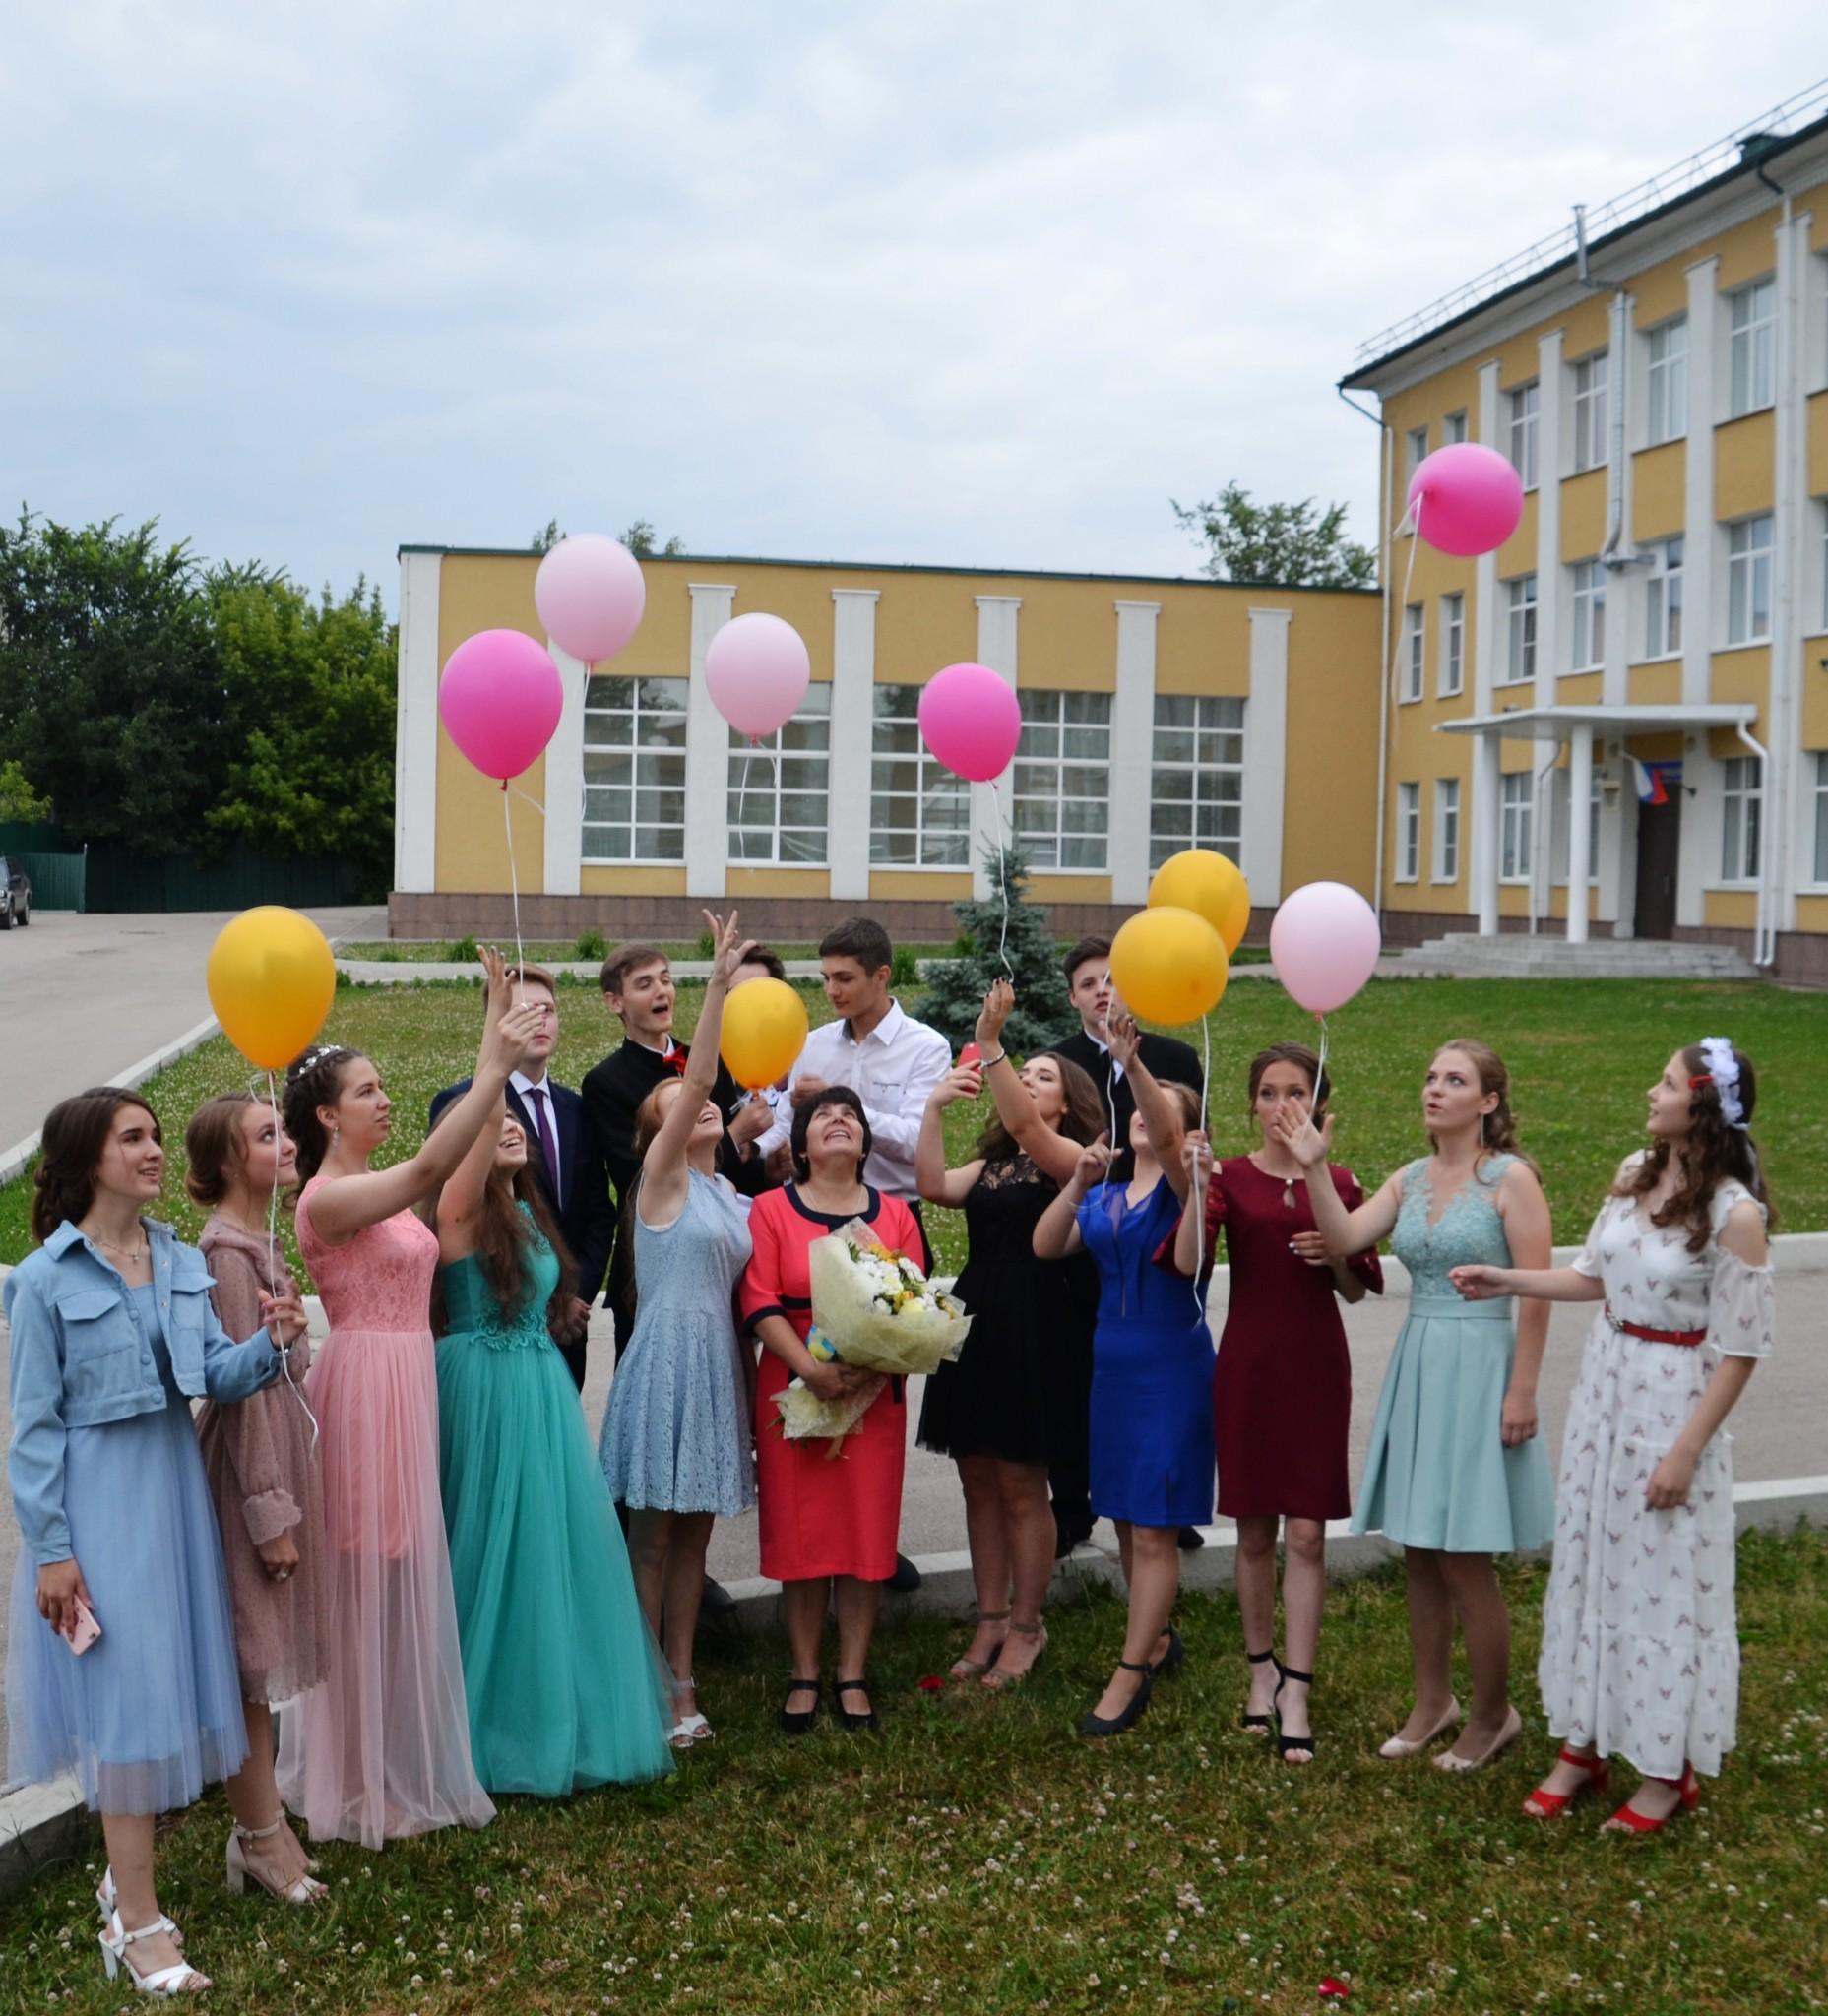 Фото из архива сайта Нижегородской митрополии за 2019 год.